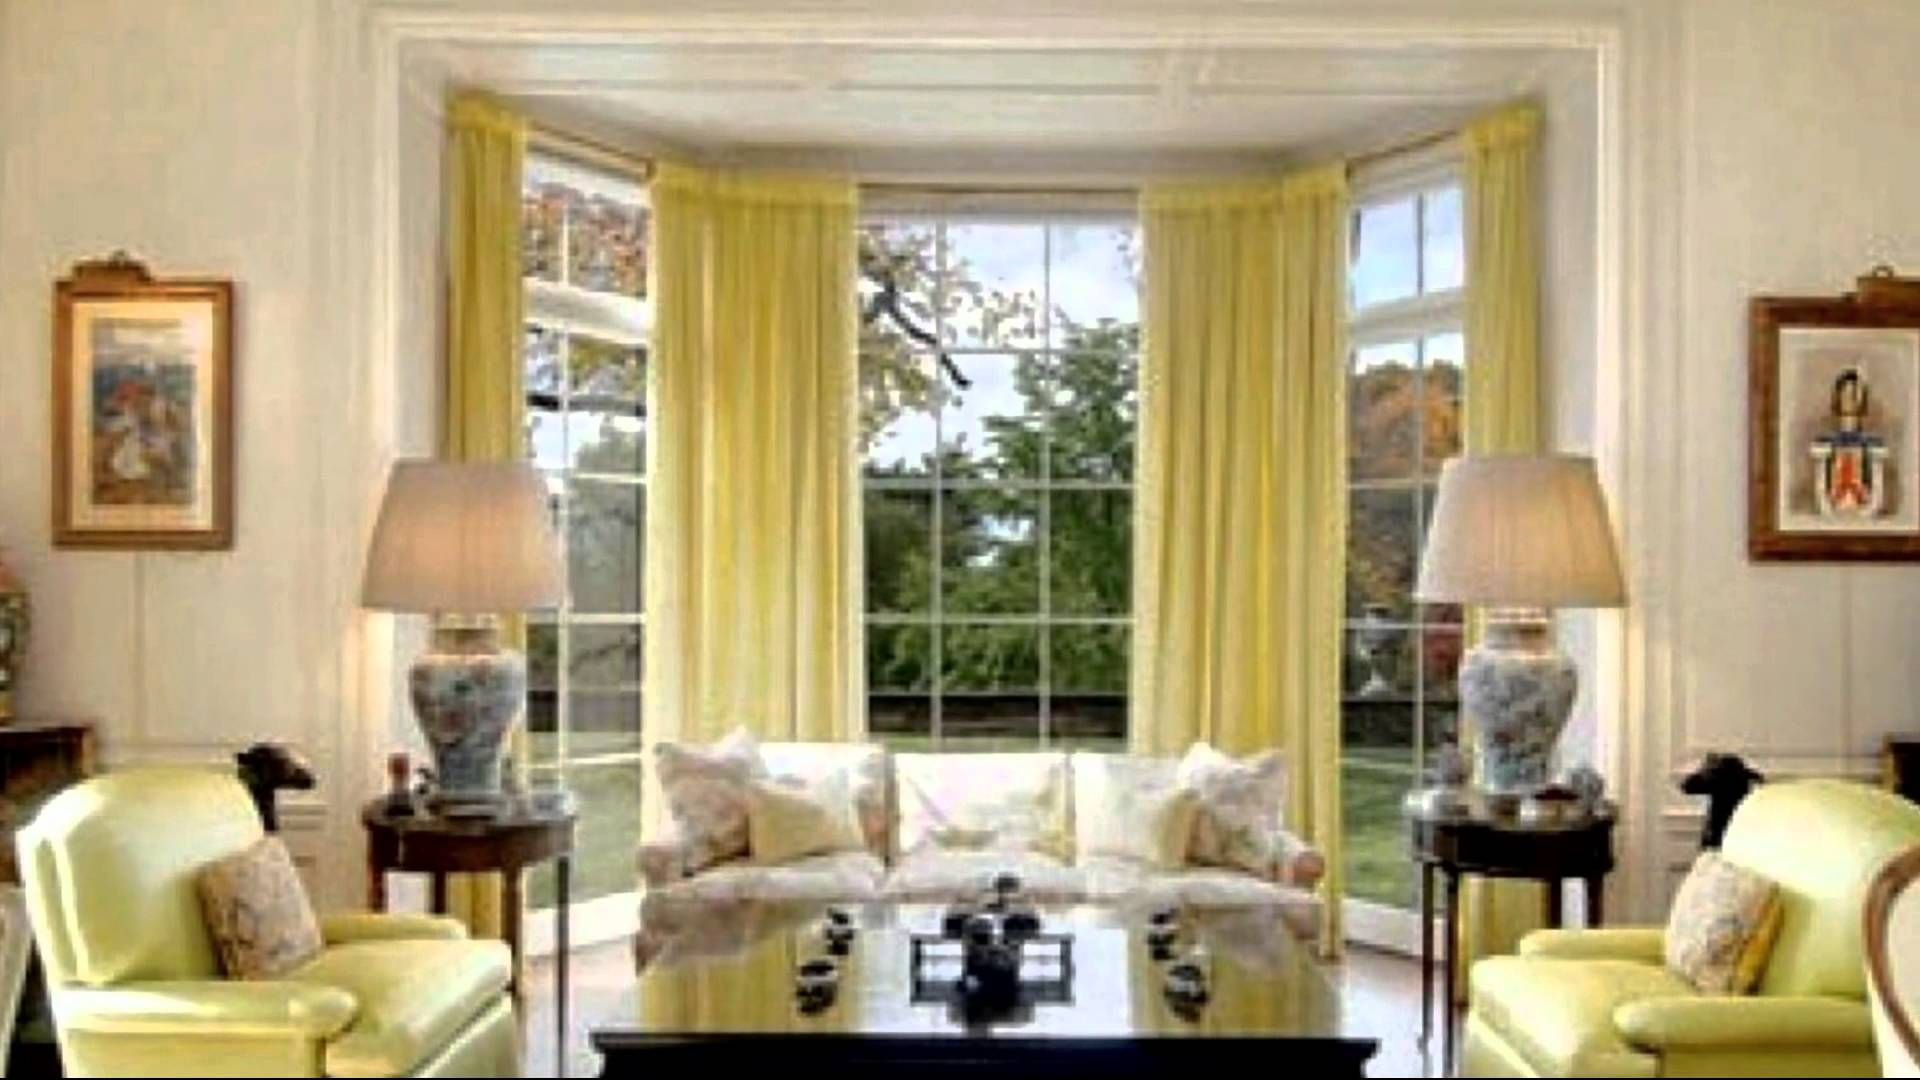 victorian style interior decorating ideas victorian homes rh pinterest com victorian wall decor ideas victorian bedroom decor ideas